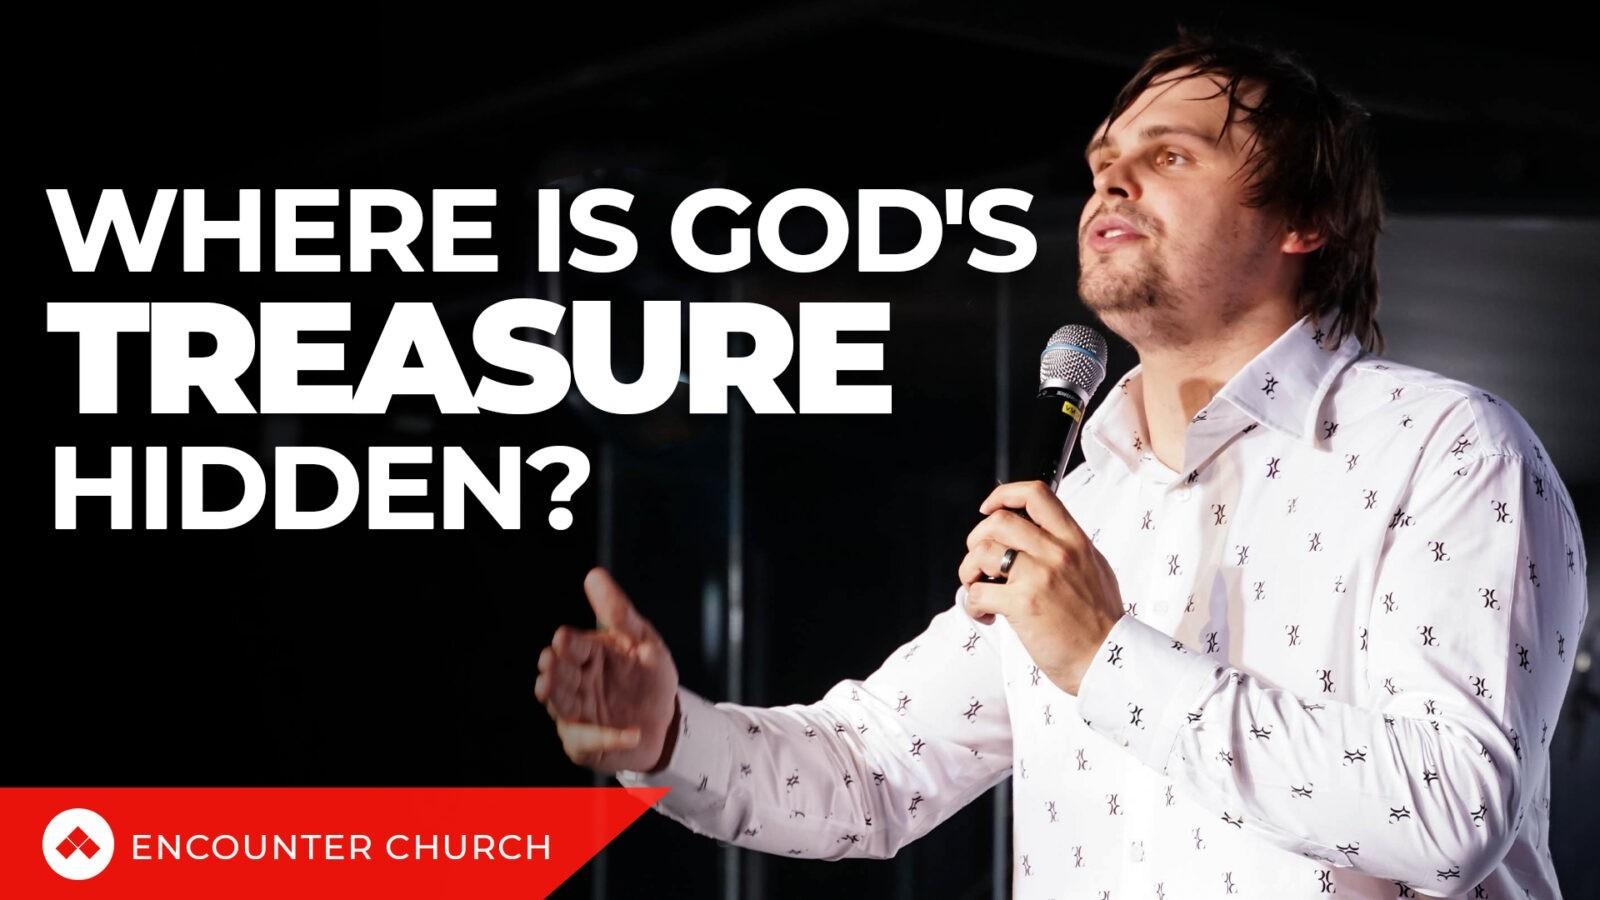 Where is God's Treasure Hidden?